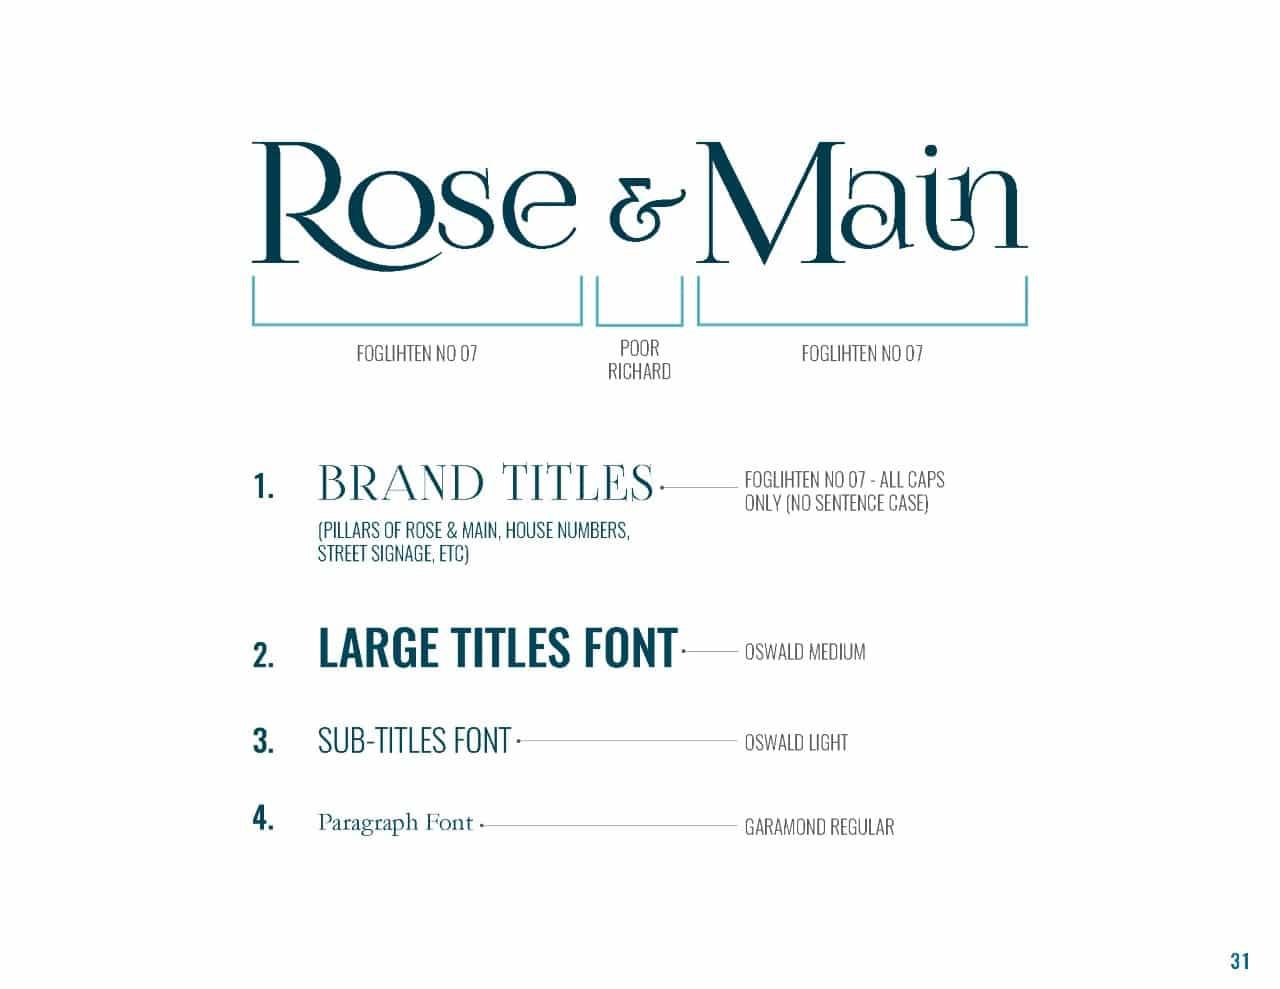 Rose & Main Brand Standards - Place Based Branding Typeface Font